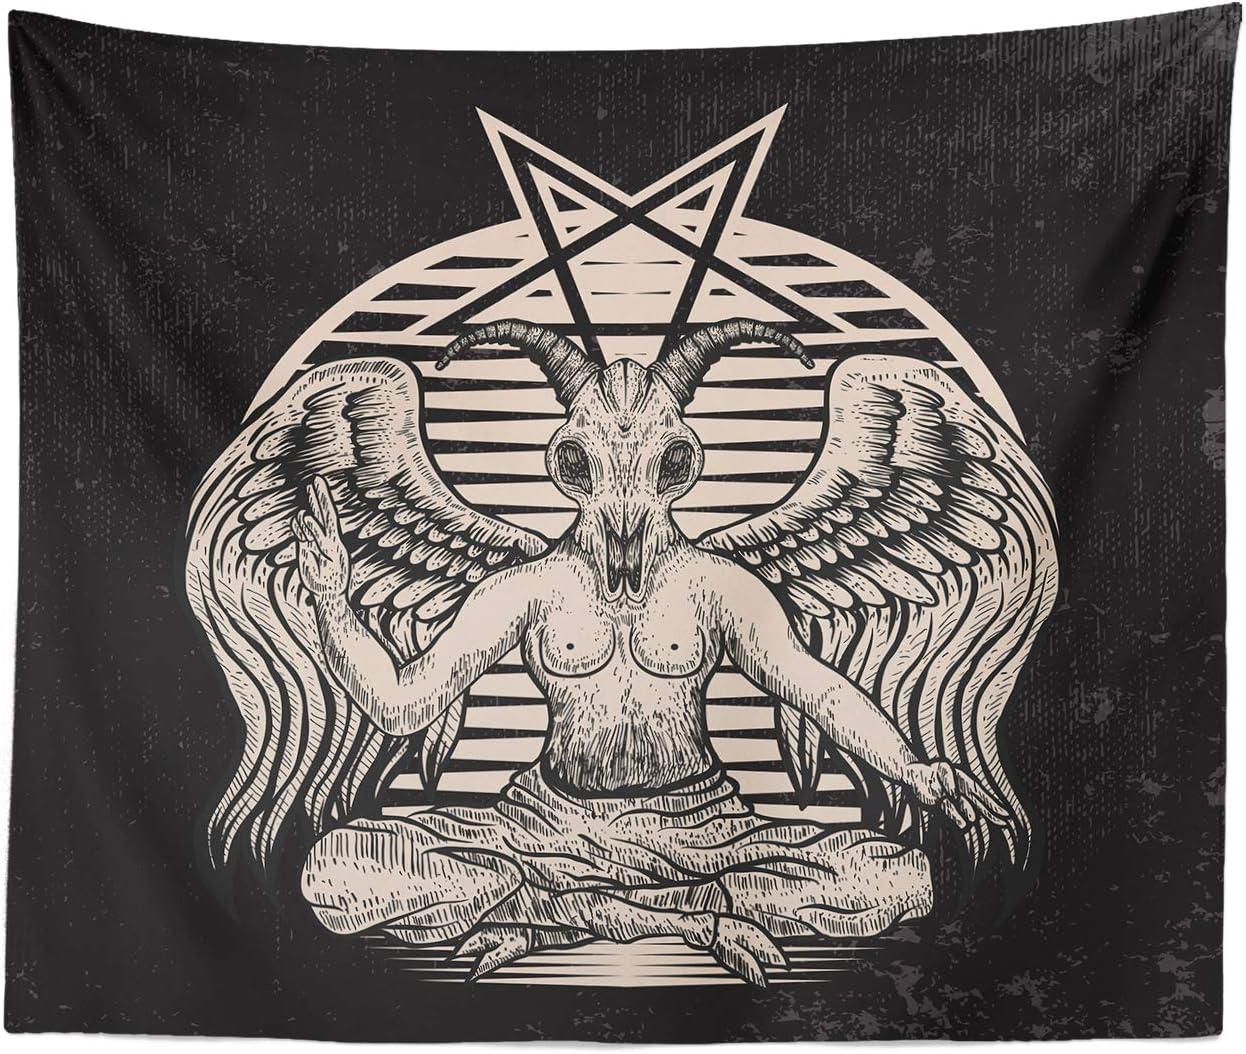 "Occult Tapestry Goat Head Pentagram Gothic Devil Demon Baphomet Satanic Symbol Tattoo Black Metal Dark Art Black Magick Home Decor Wall Hanging (Baphomet, 59"" x 79"")"